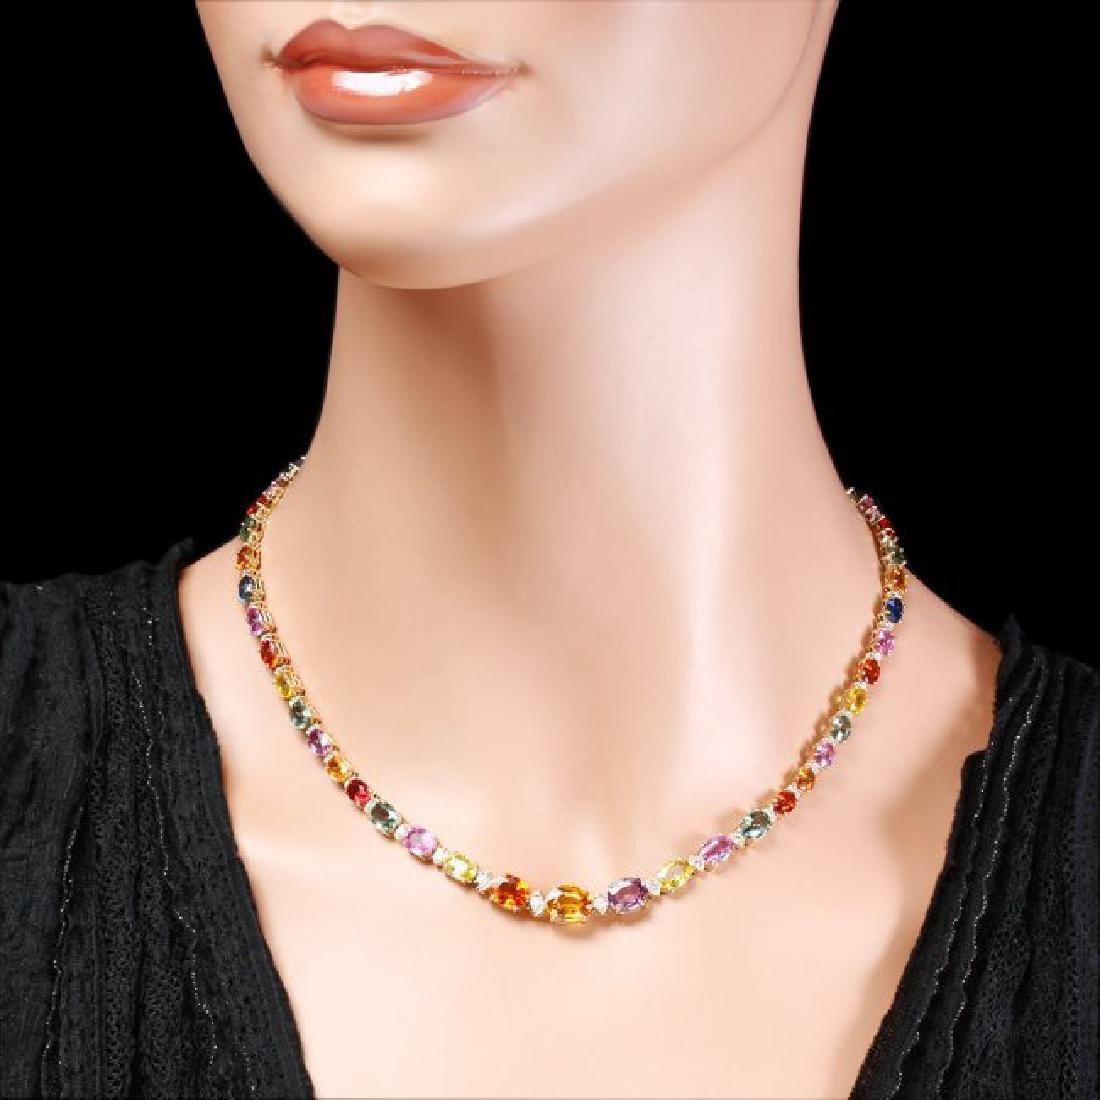 14k Gold 33ct Sapphire 1.2ct Diamond Necklace - 6